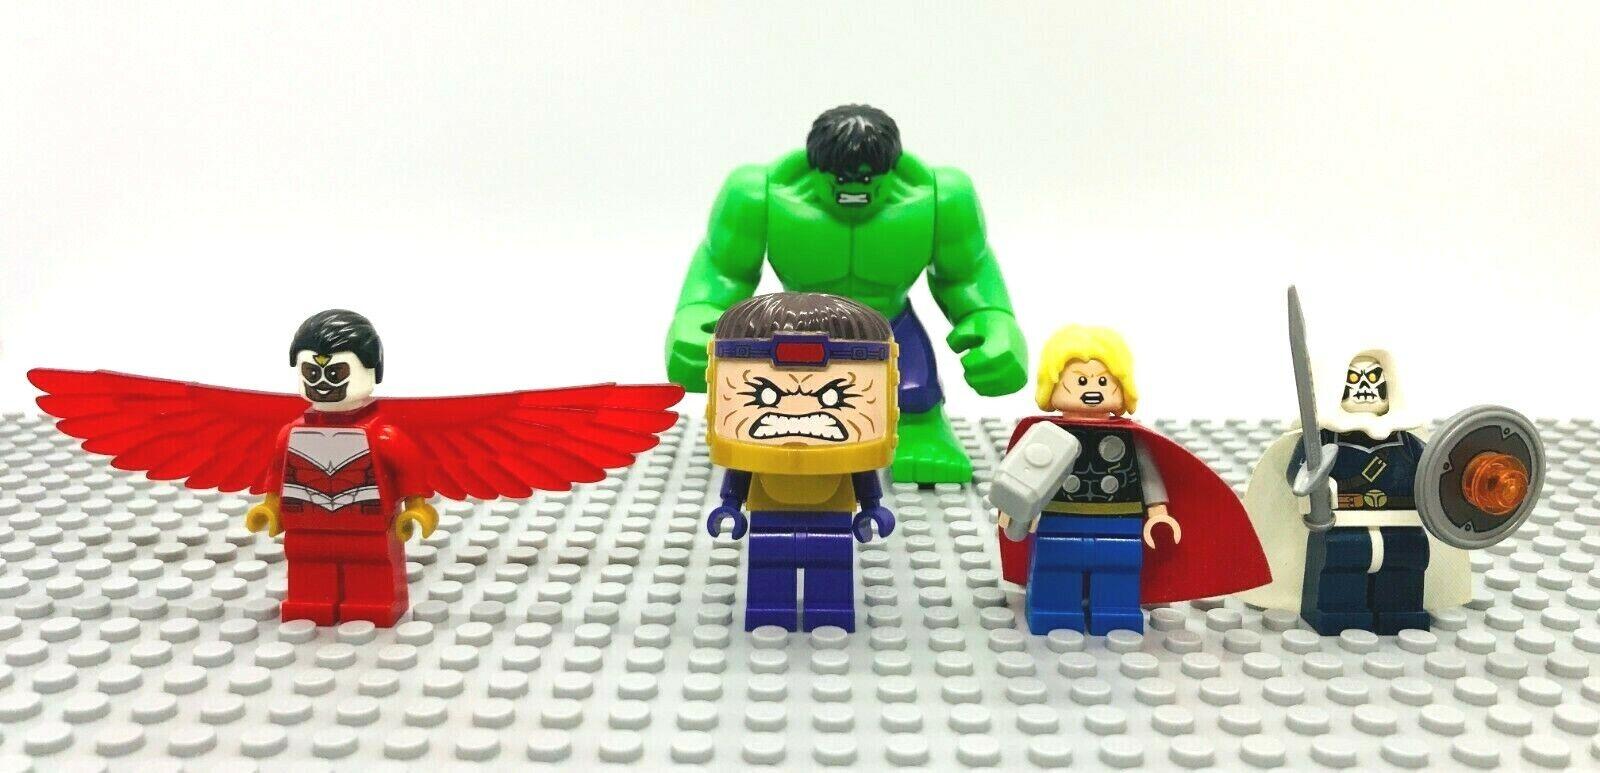 Lego Hulk Falcon MODOK Taskmaster Thor Minifigures 76018 Super Heroes Avengers